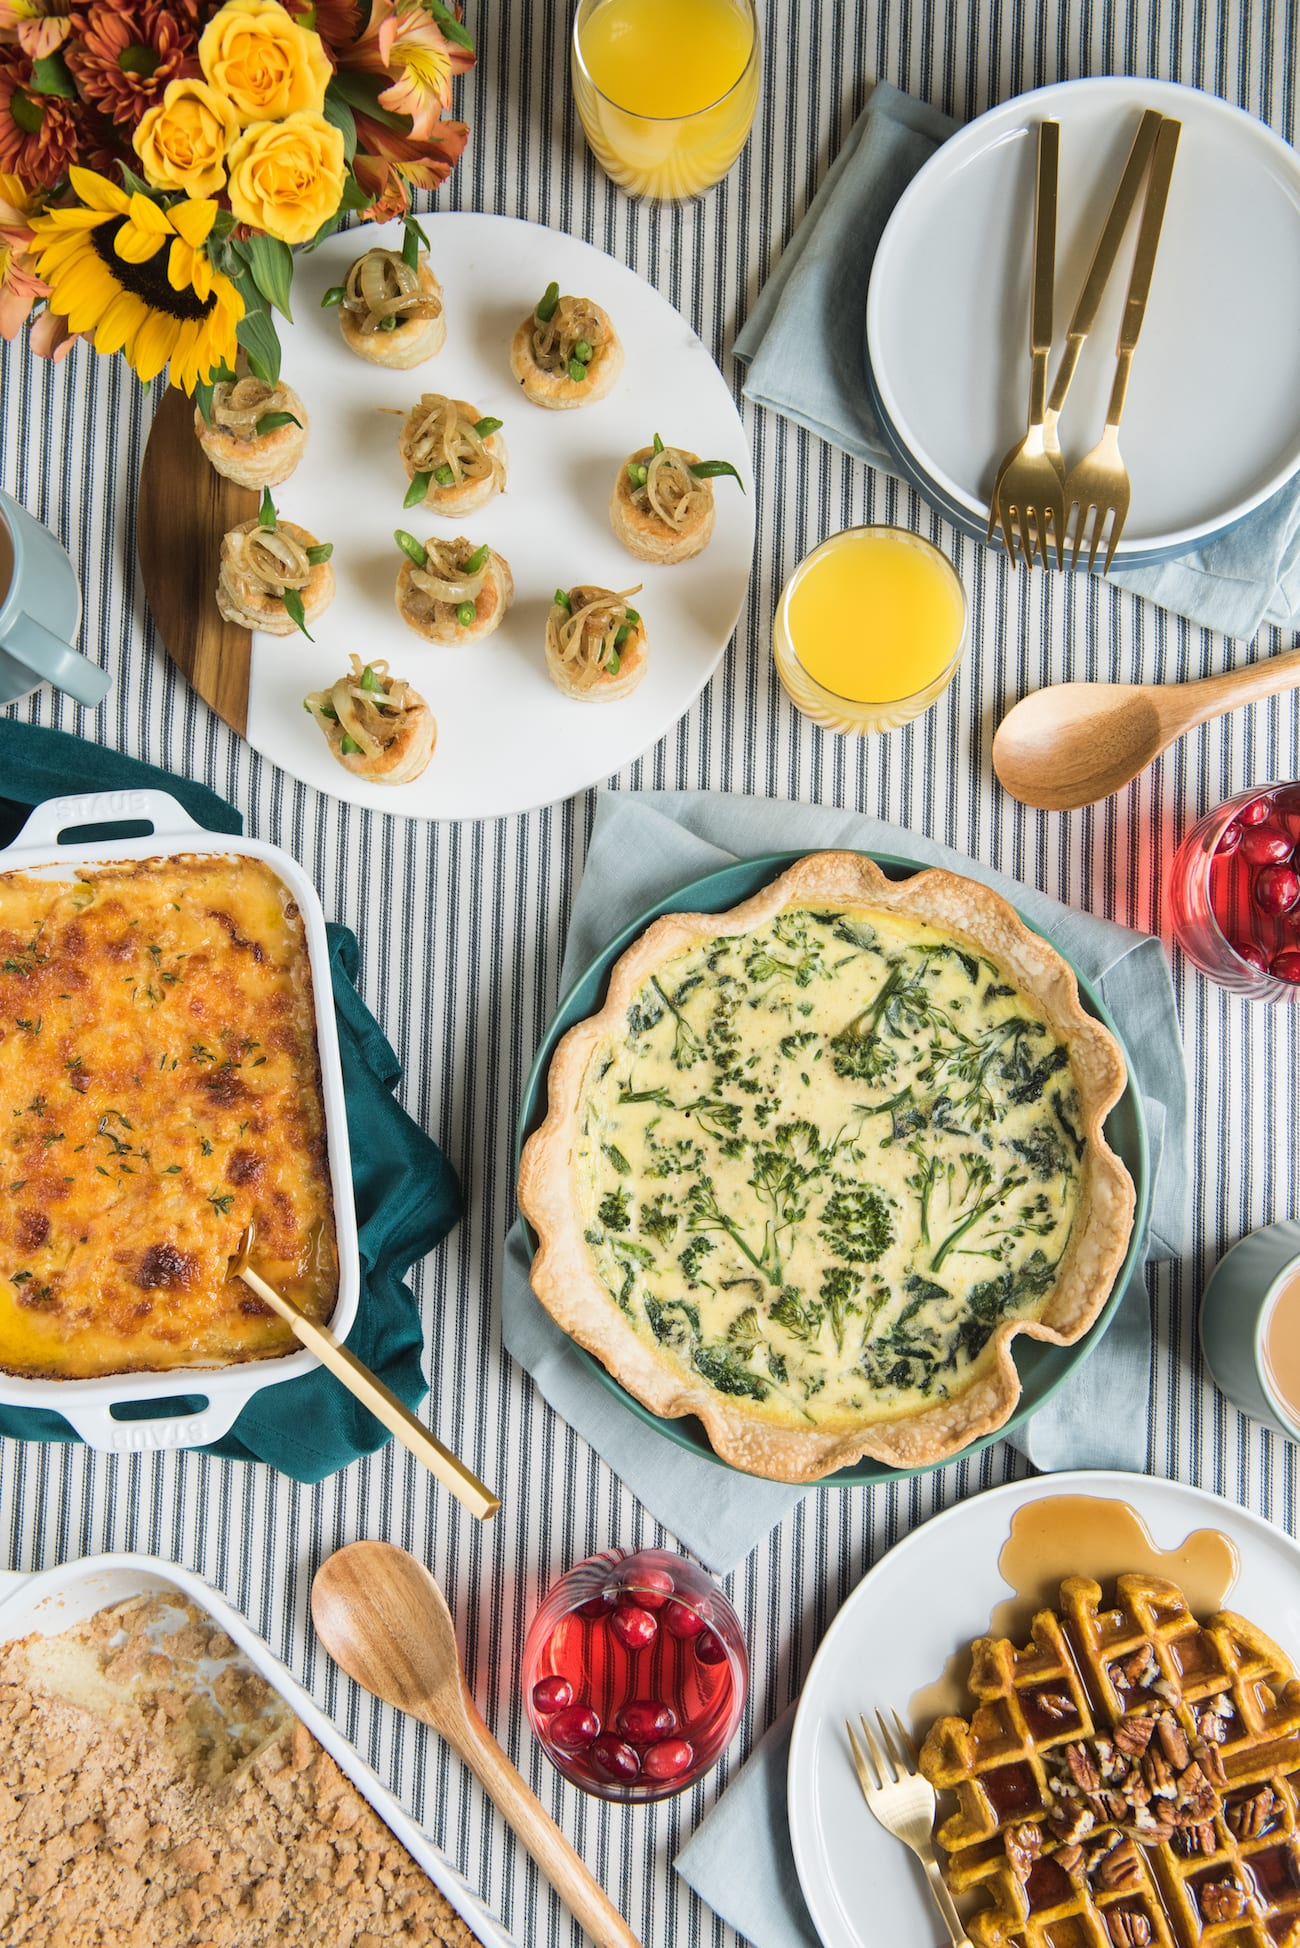 A Friendsgiving Brunch | Friendsgiving ideas, Friendsgiving recipes, entertaining tips and more from entertaining blog @cydconverse